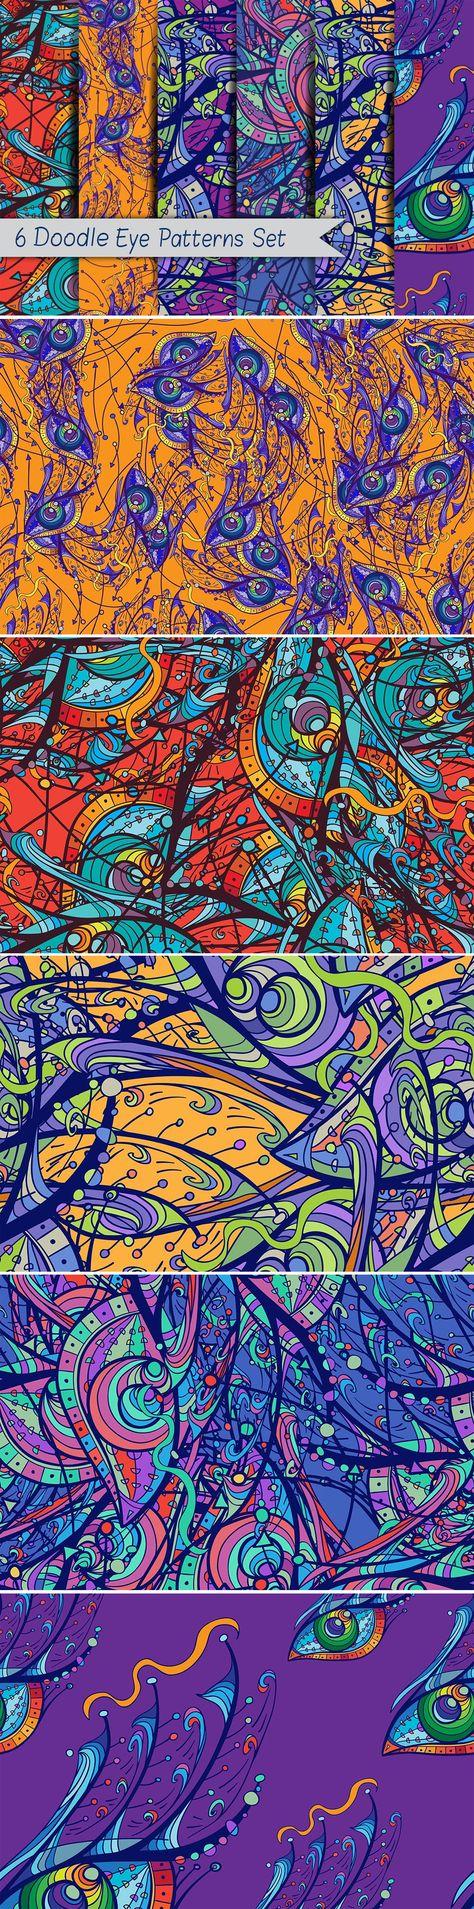 6 Doodle Eye Patterns Set